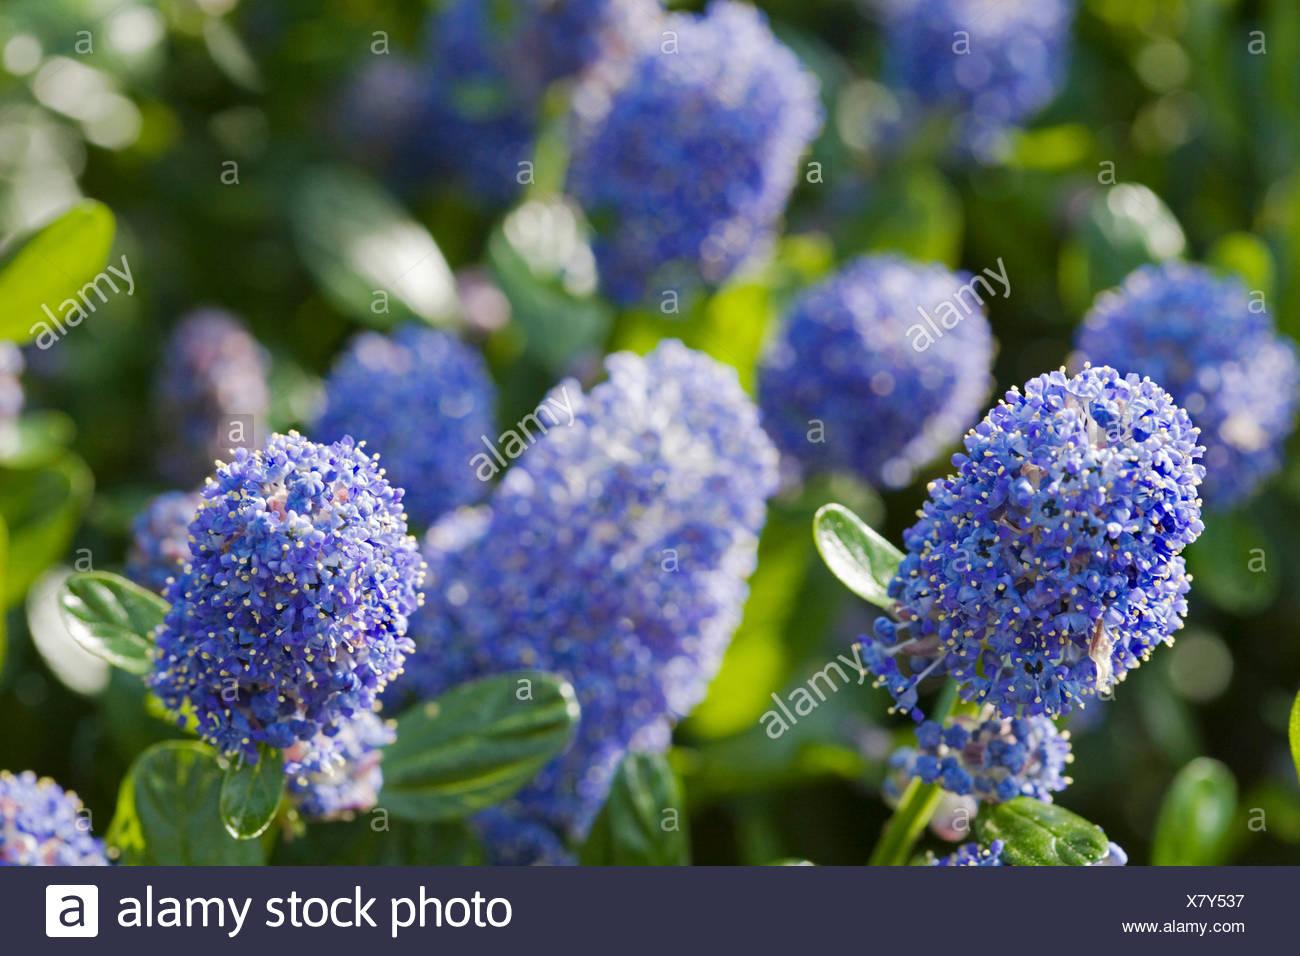 CEANOTHUS THYRSIFLORUS SKYLARK Un Arbusto Sempreverde Con Cluster Di Blu  Scuro Fiori In Primavera Ed Estate